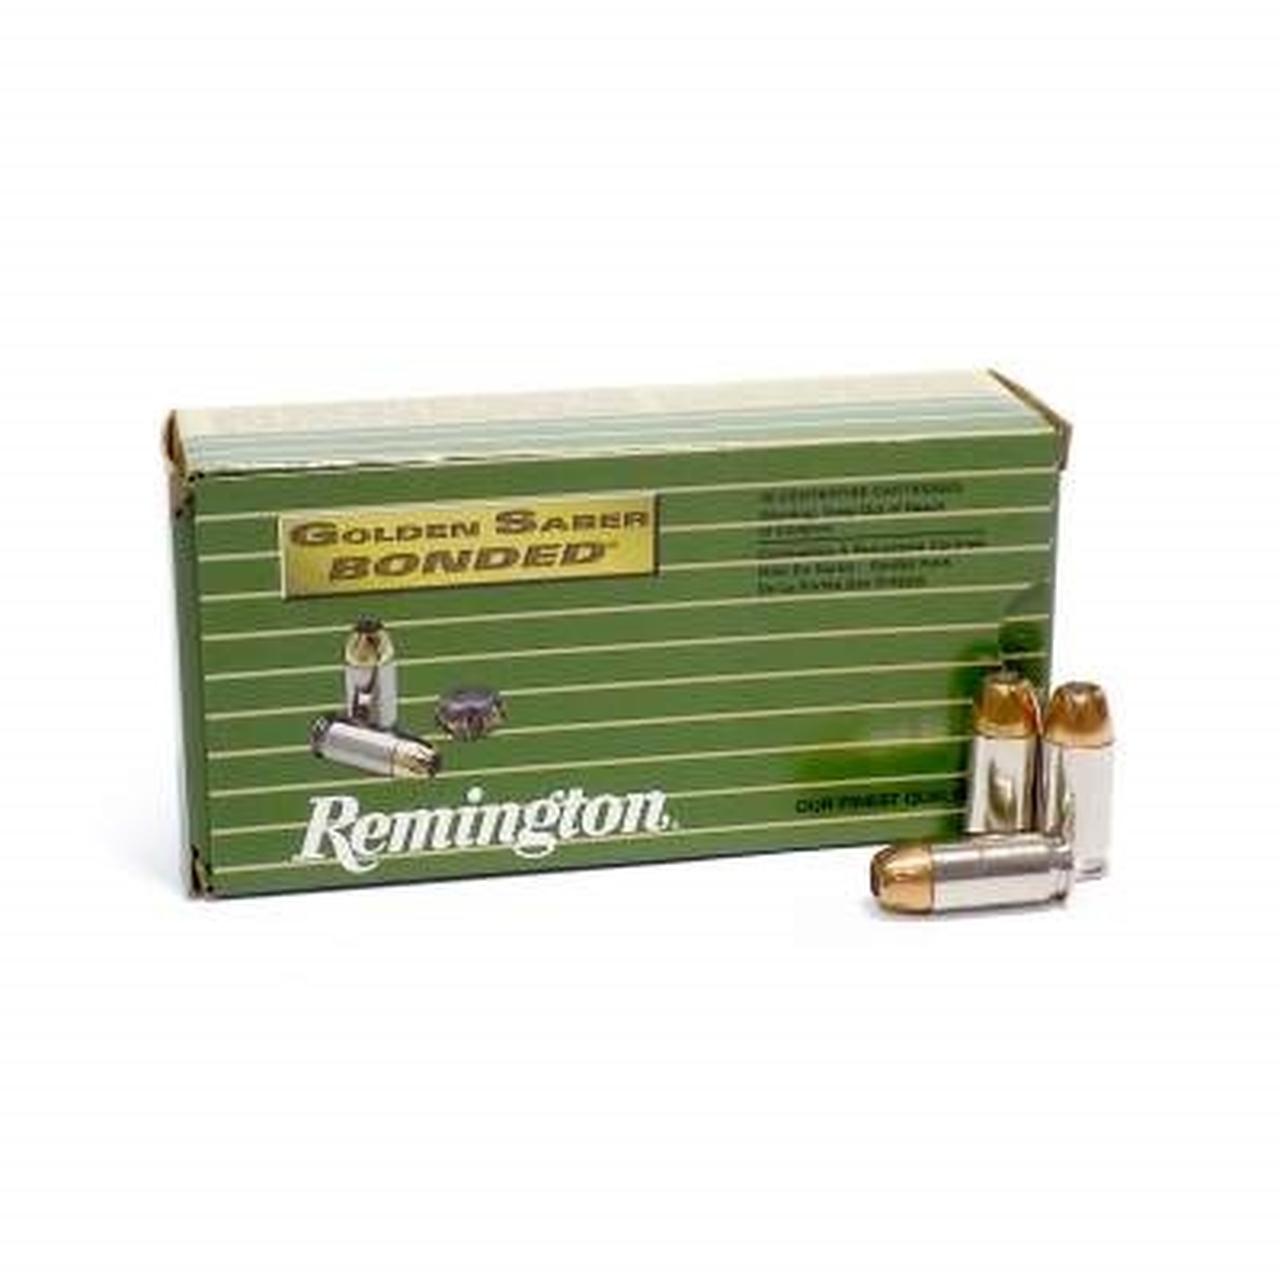 Remington Golden Saber 45 ACP 230gr Bonded JHP - 50 rnds | GSB45APB-